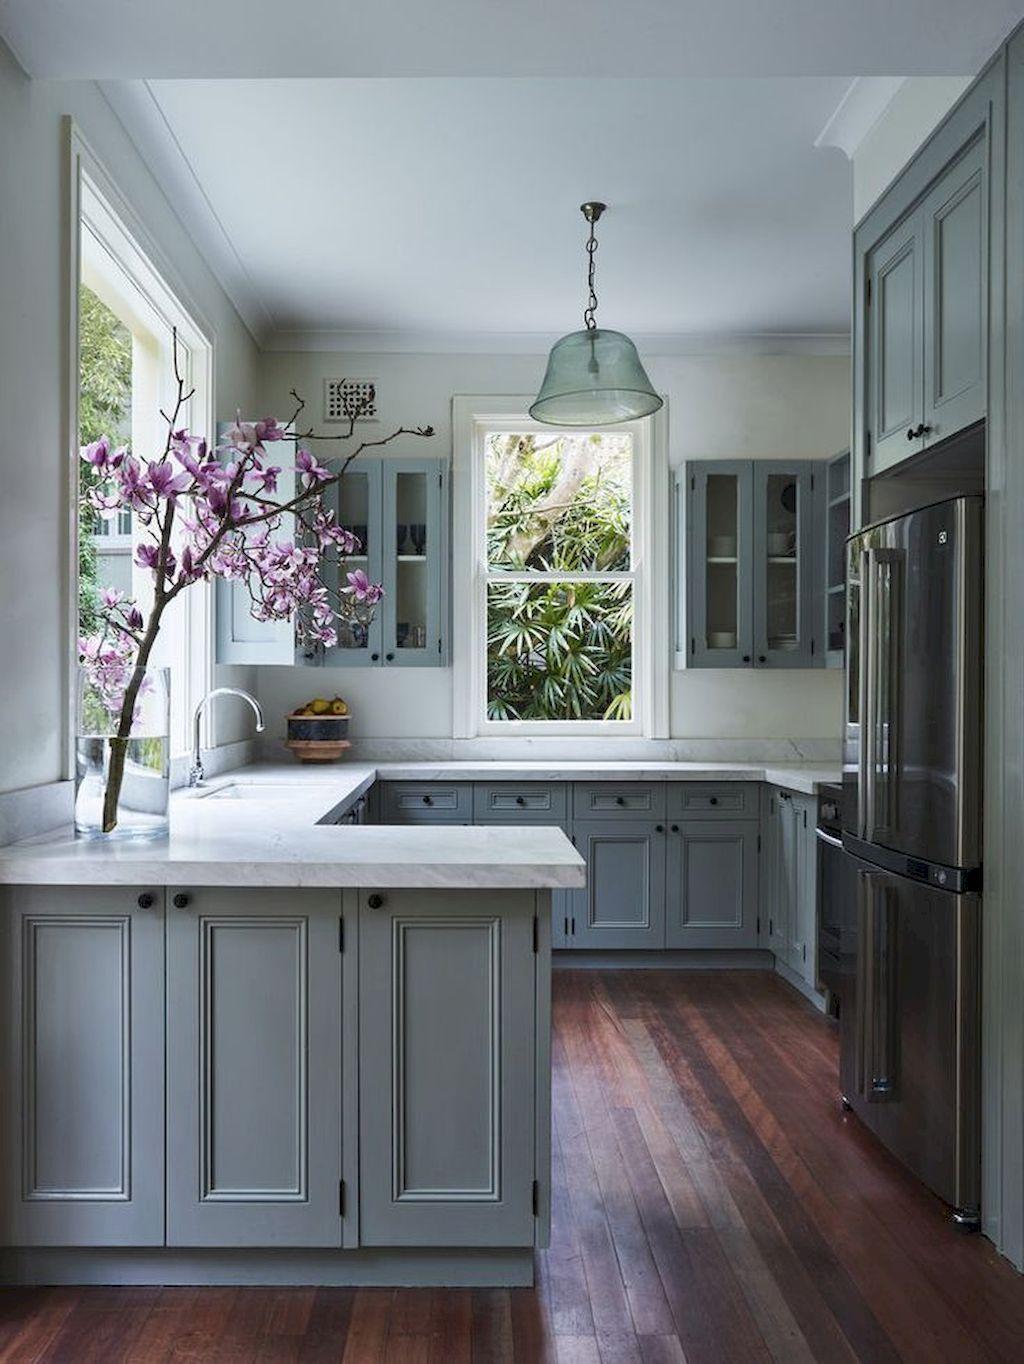 Farmhouse Kitchen Cabinet Ideas to Make Your Kitchen Design more ...